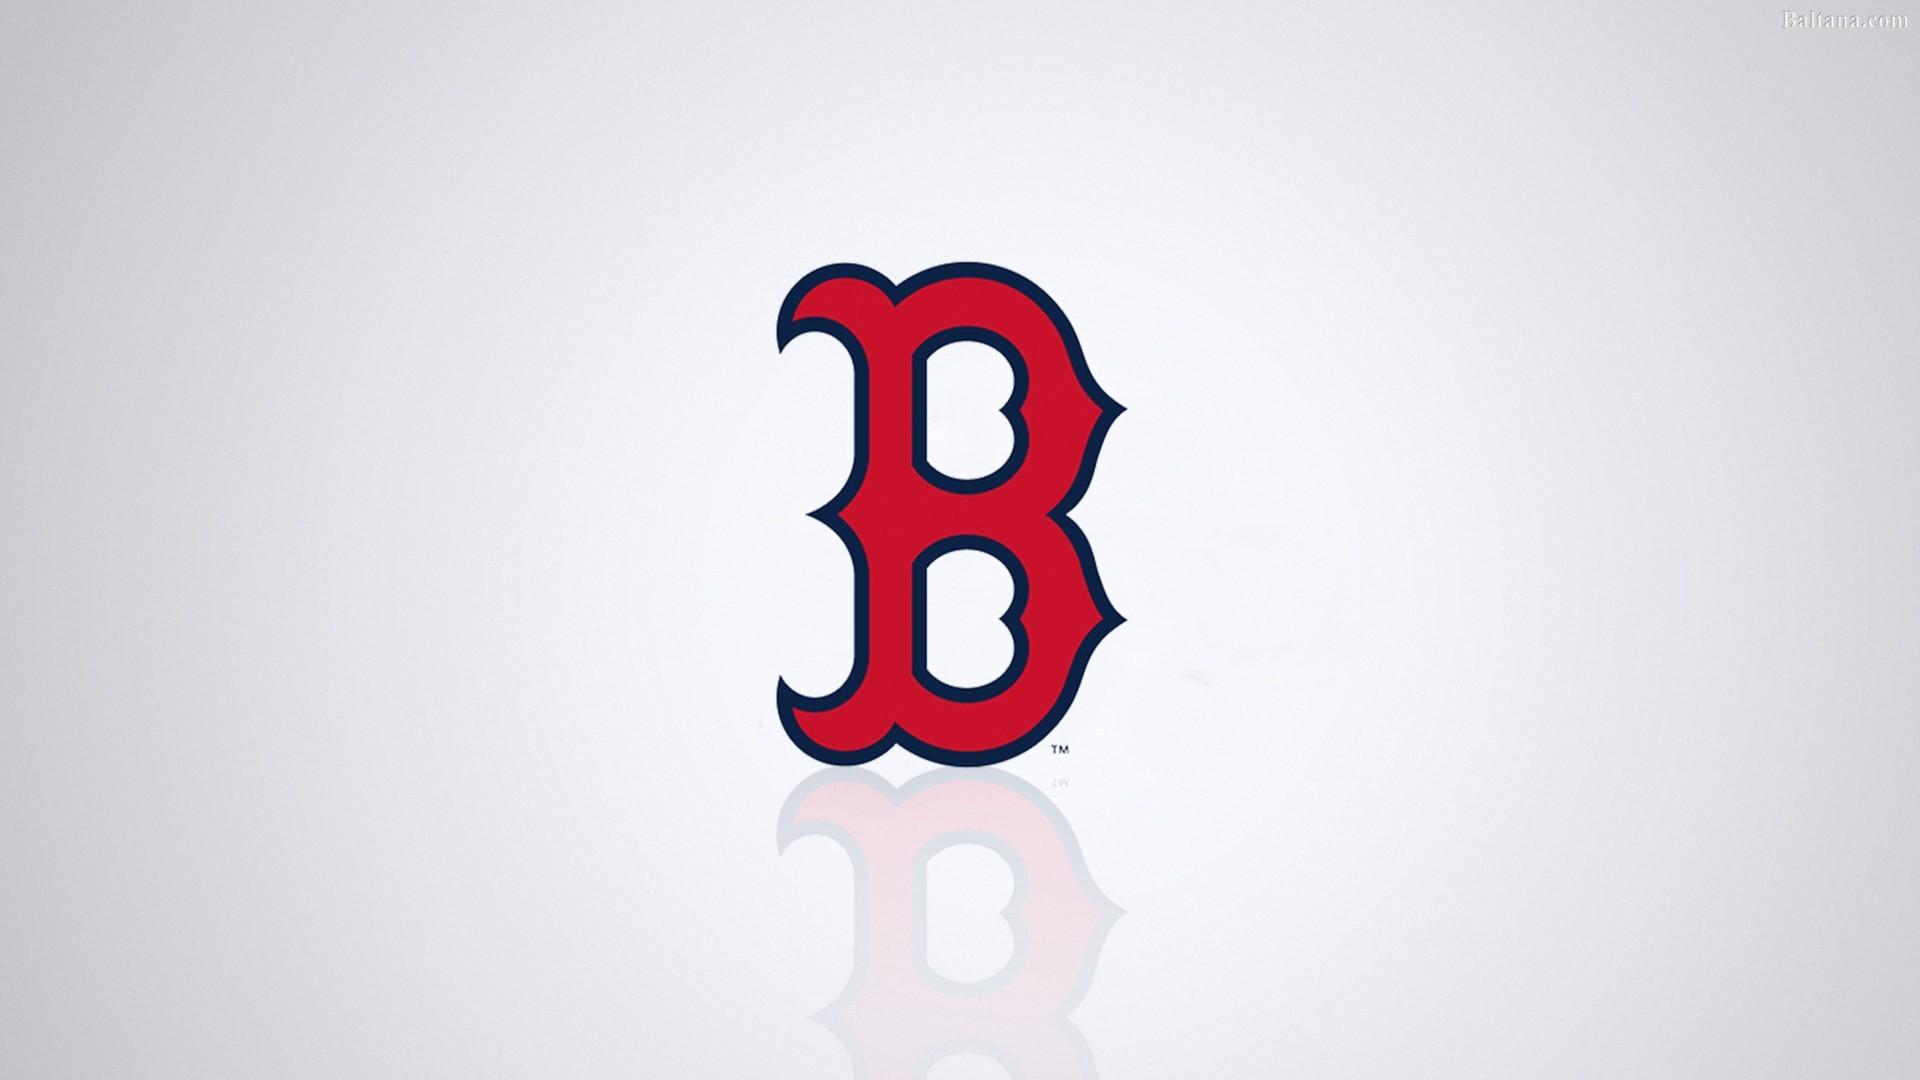 Boston Red Sox Background Wallpaper 33002   Baltana 1920x1080